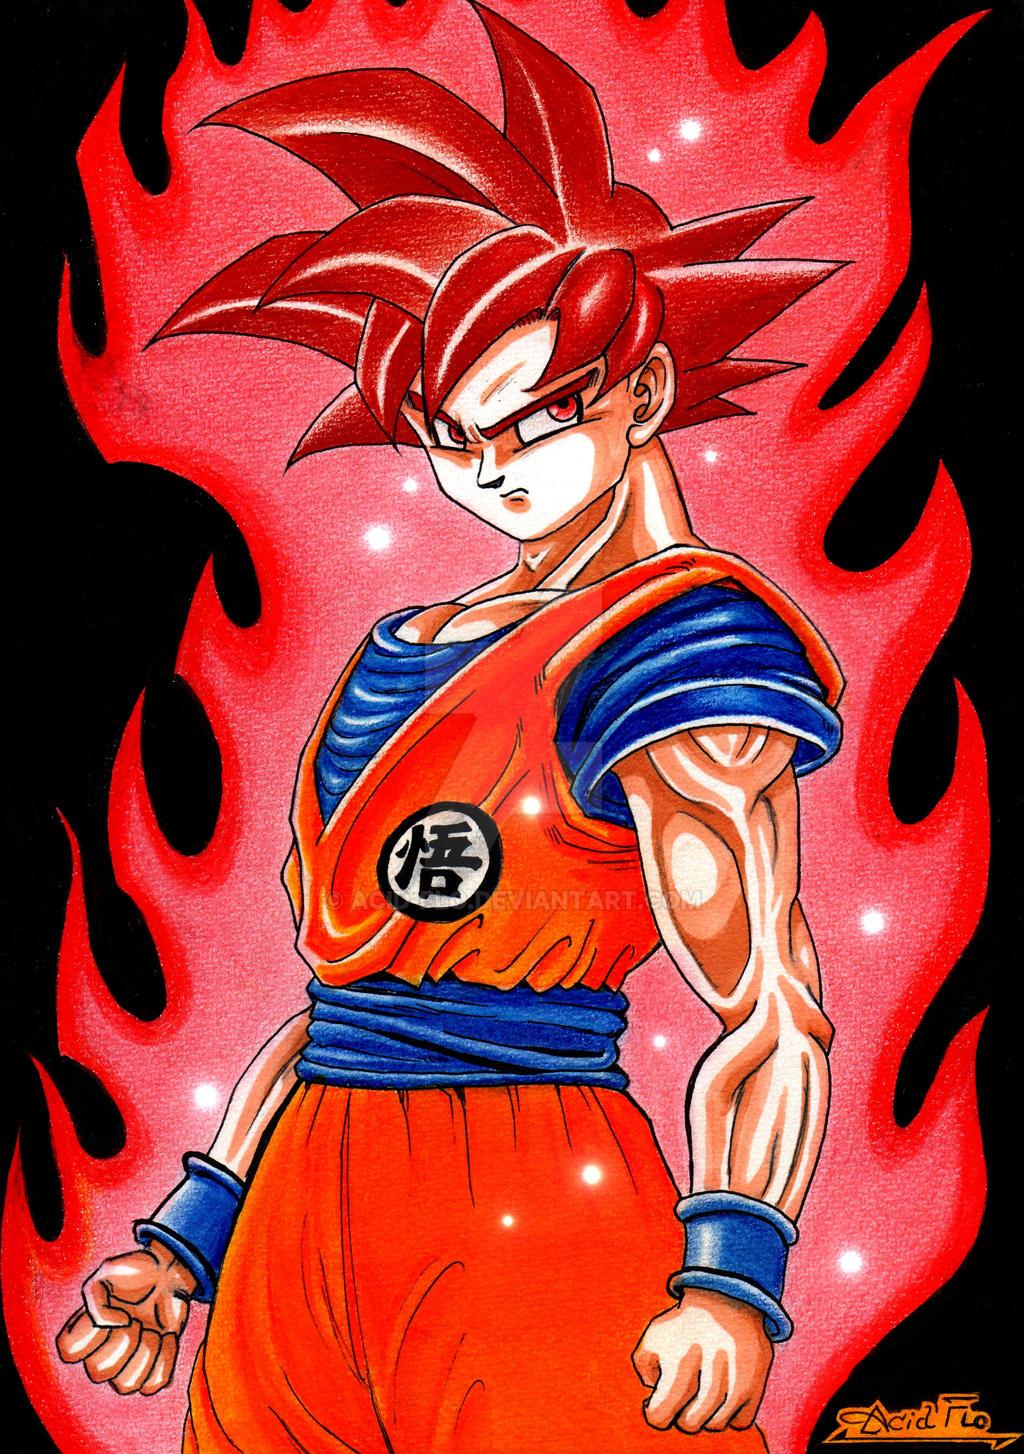 Wallpaper Goku Super Saiyan 100